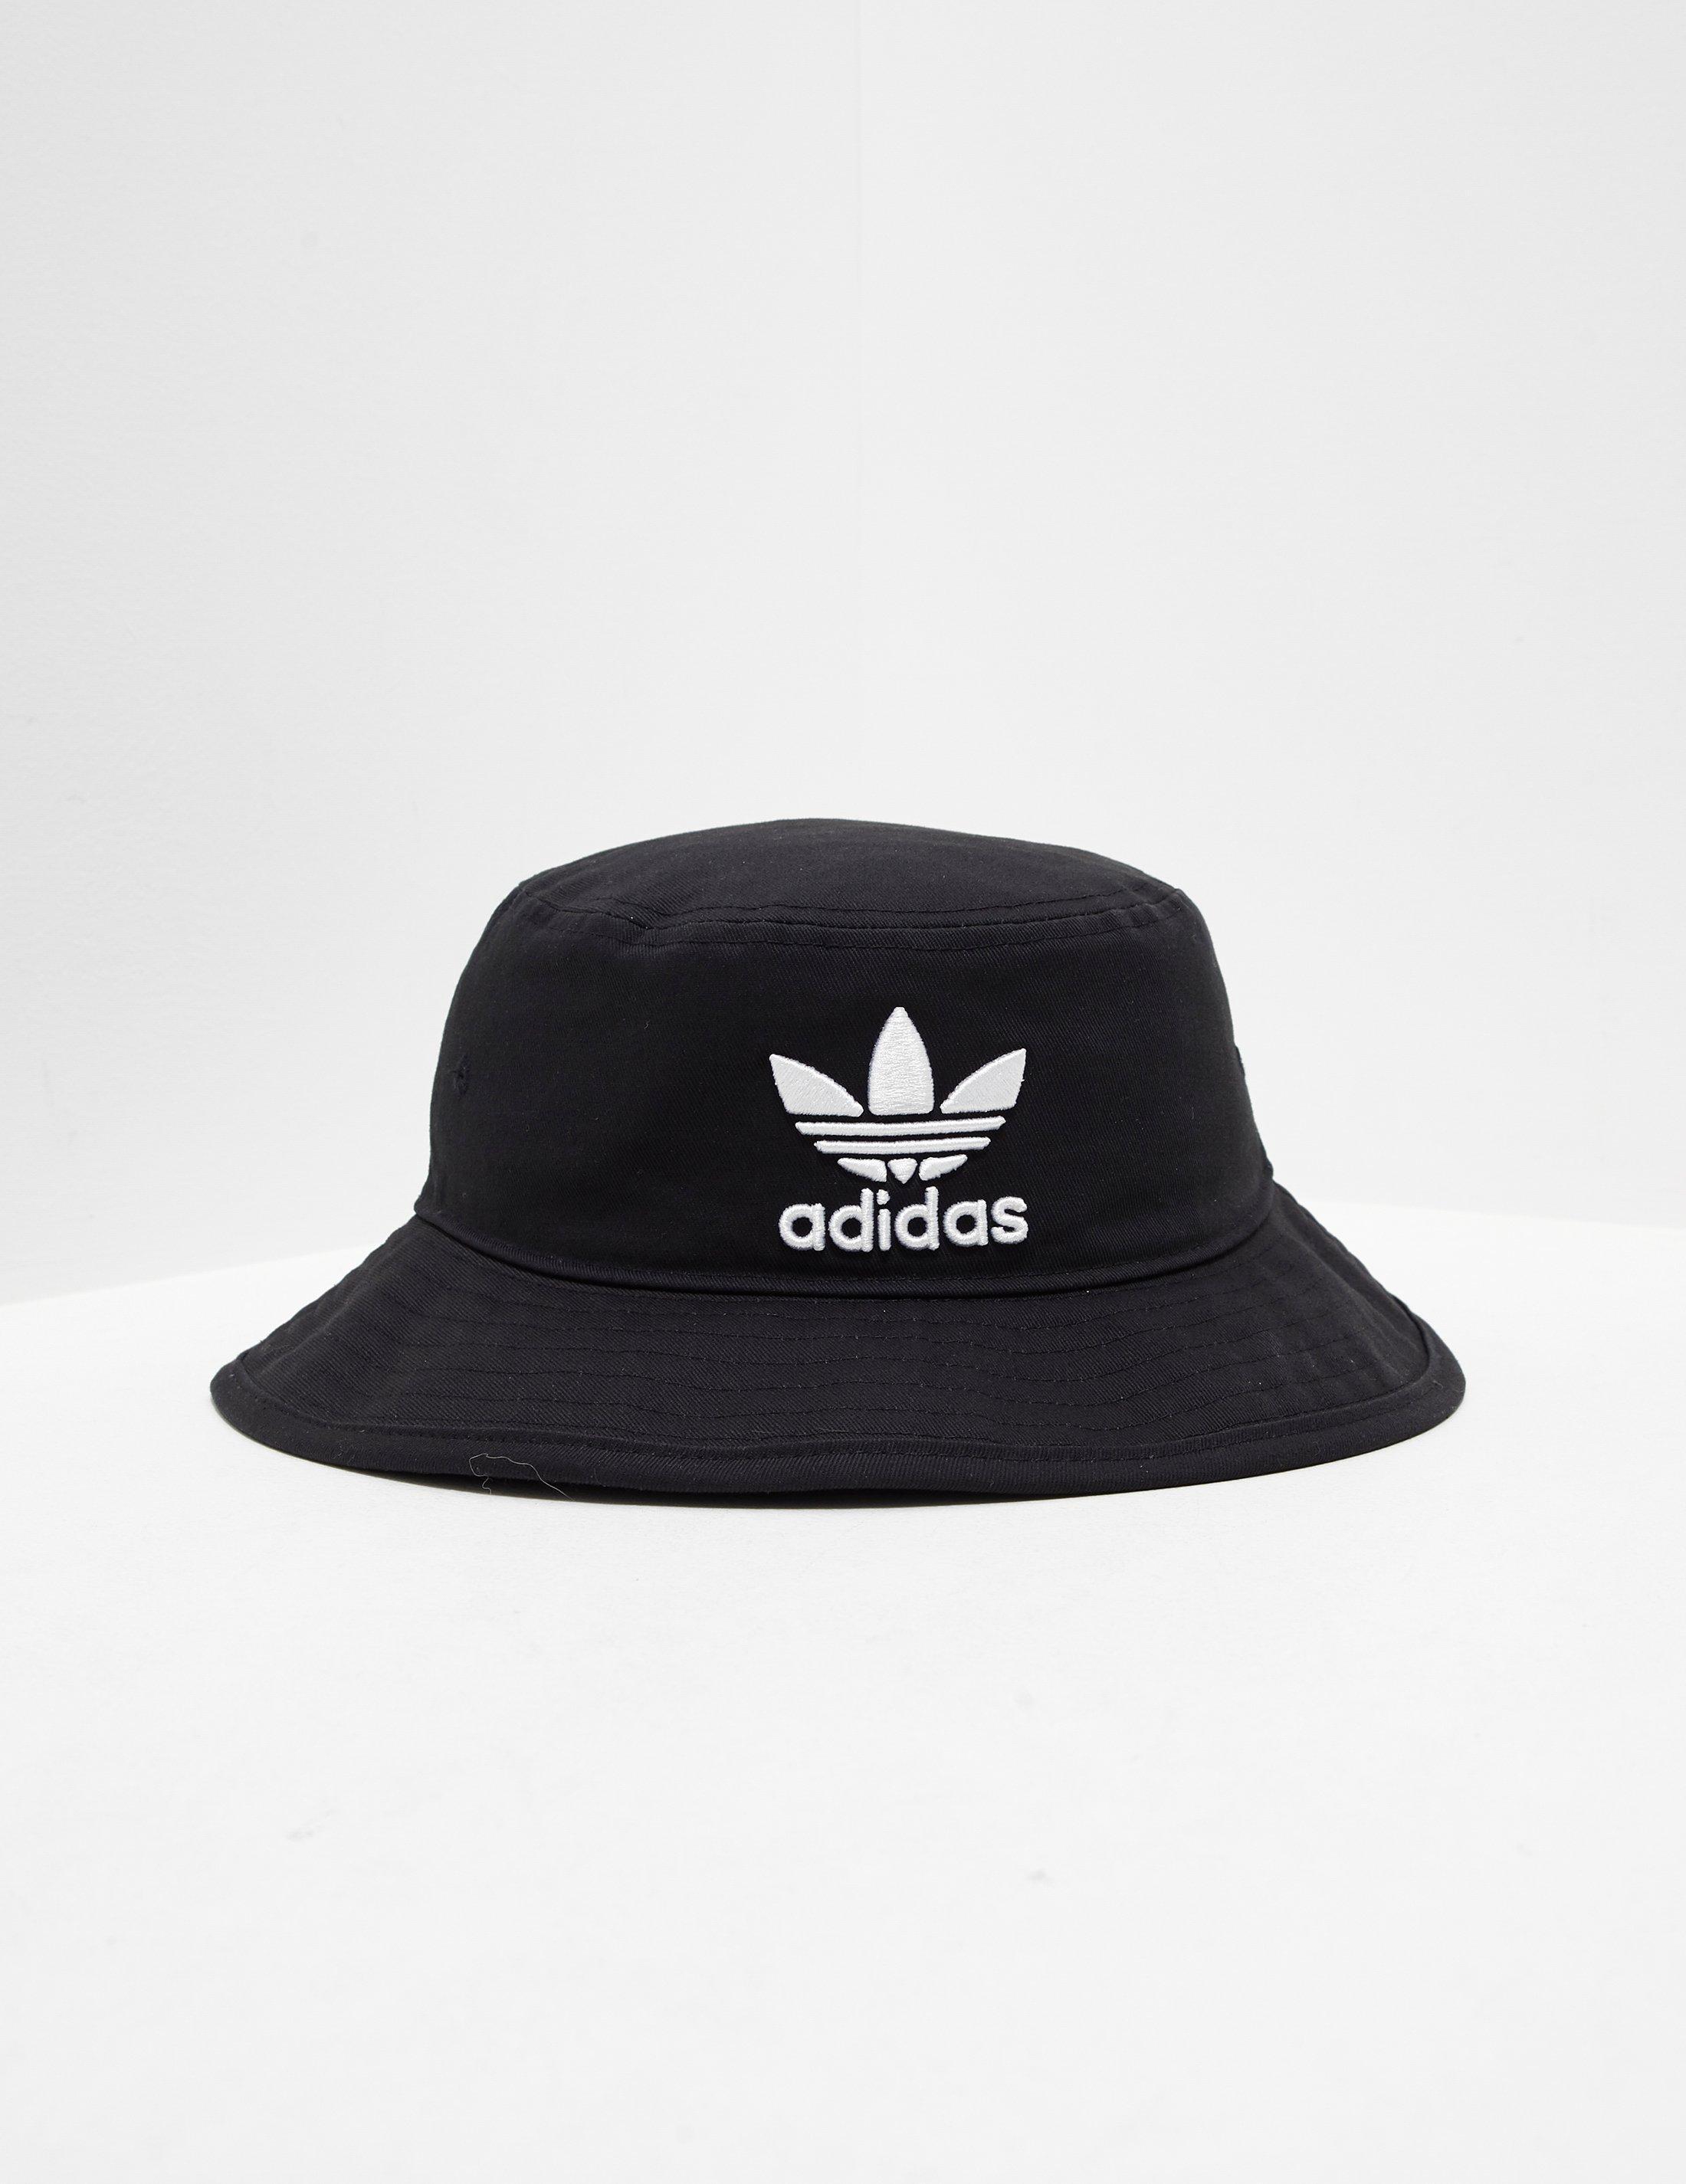 92273c24f2e adidas Originals Mens Trefoil Bucket Hat Black black in Black for ...